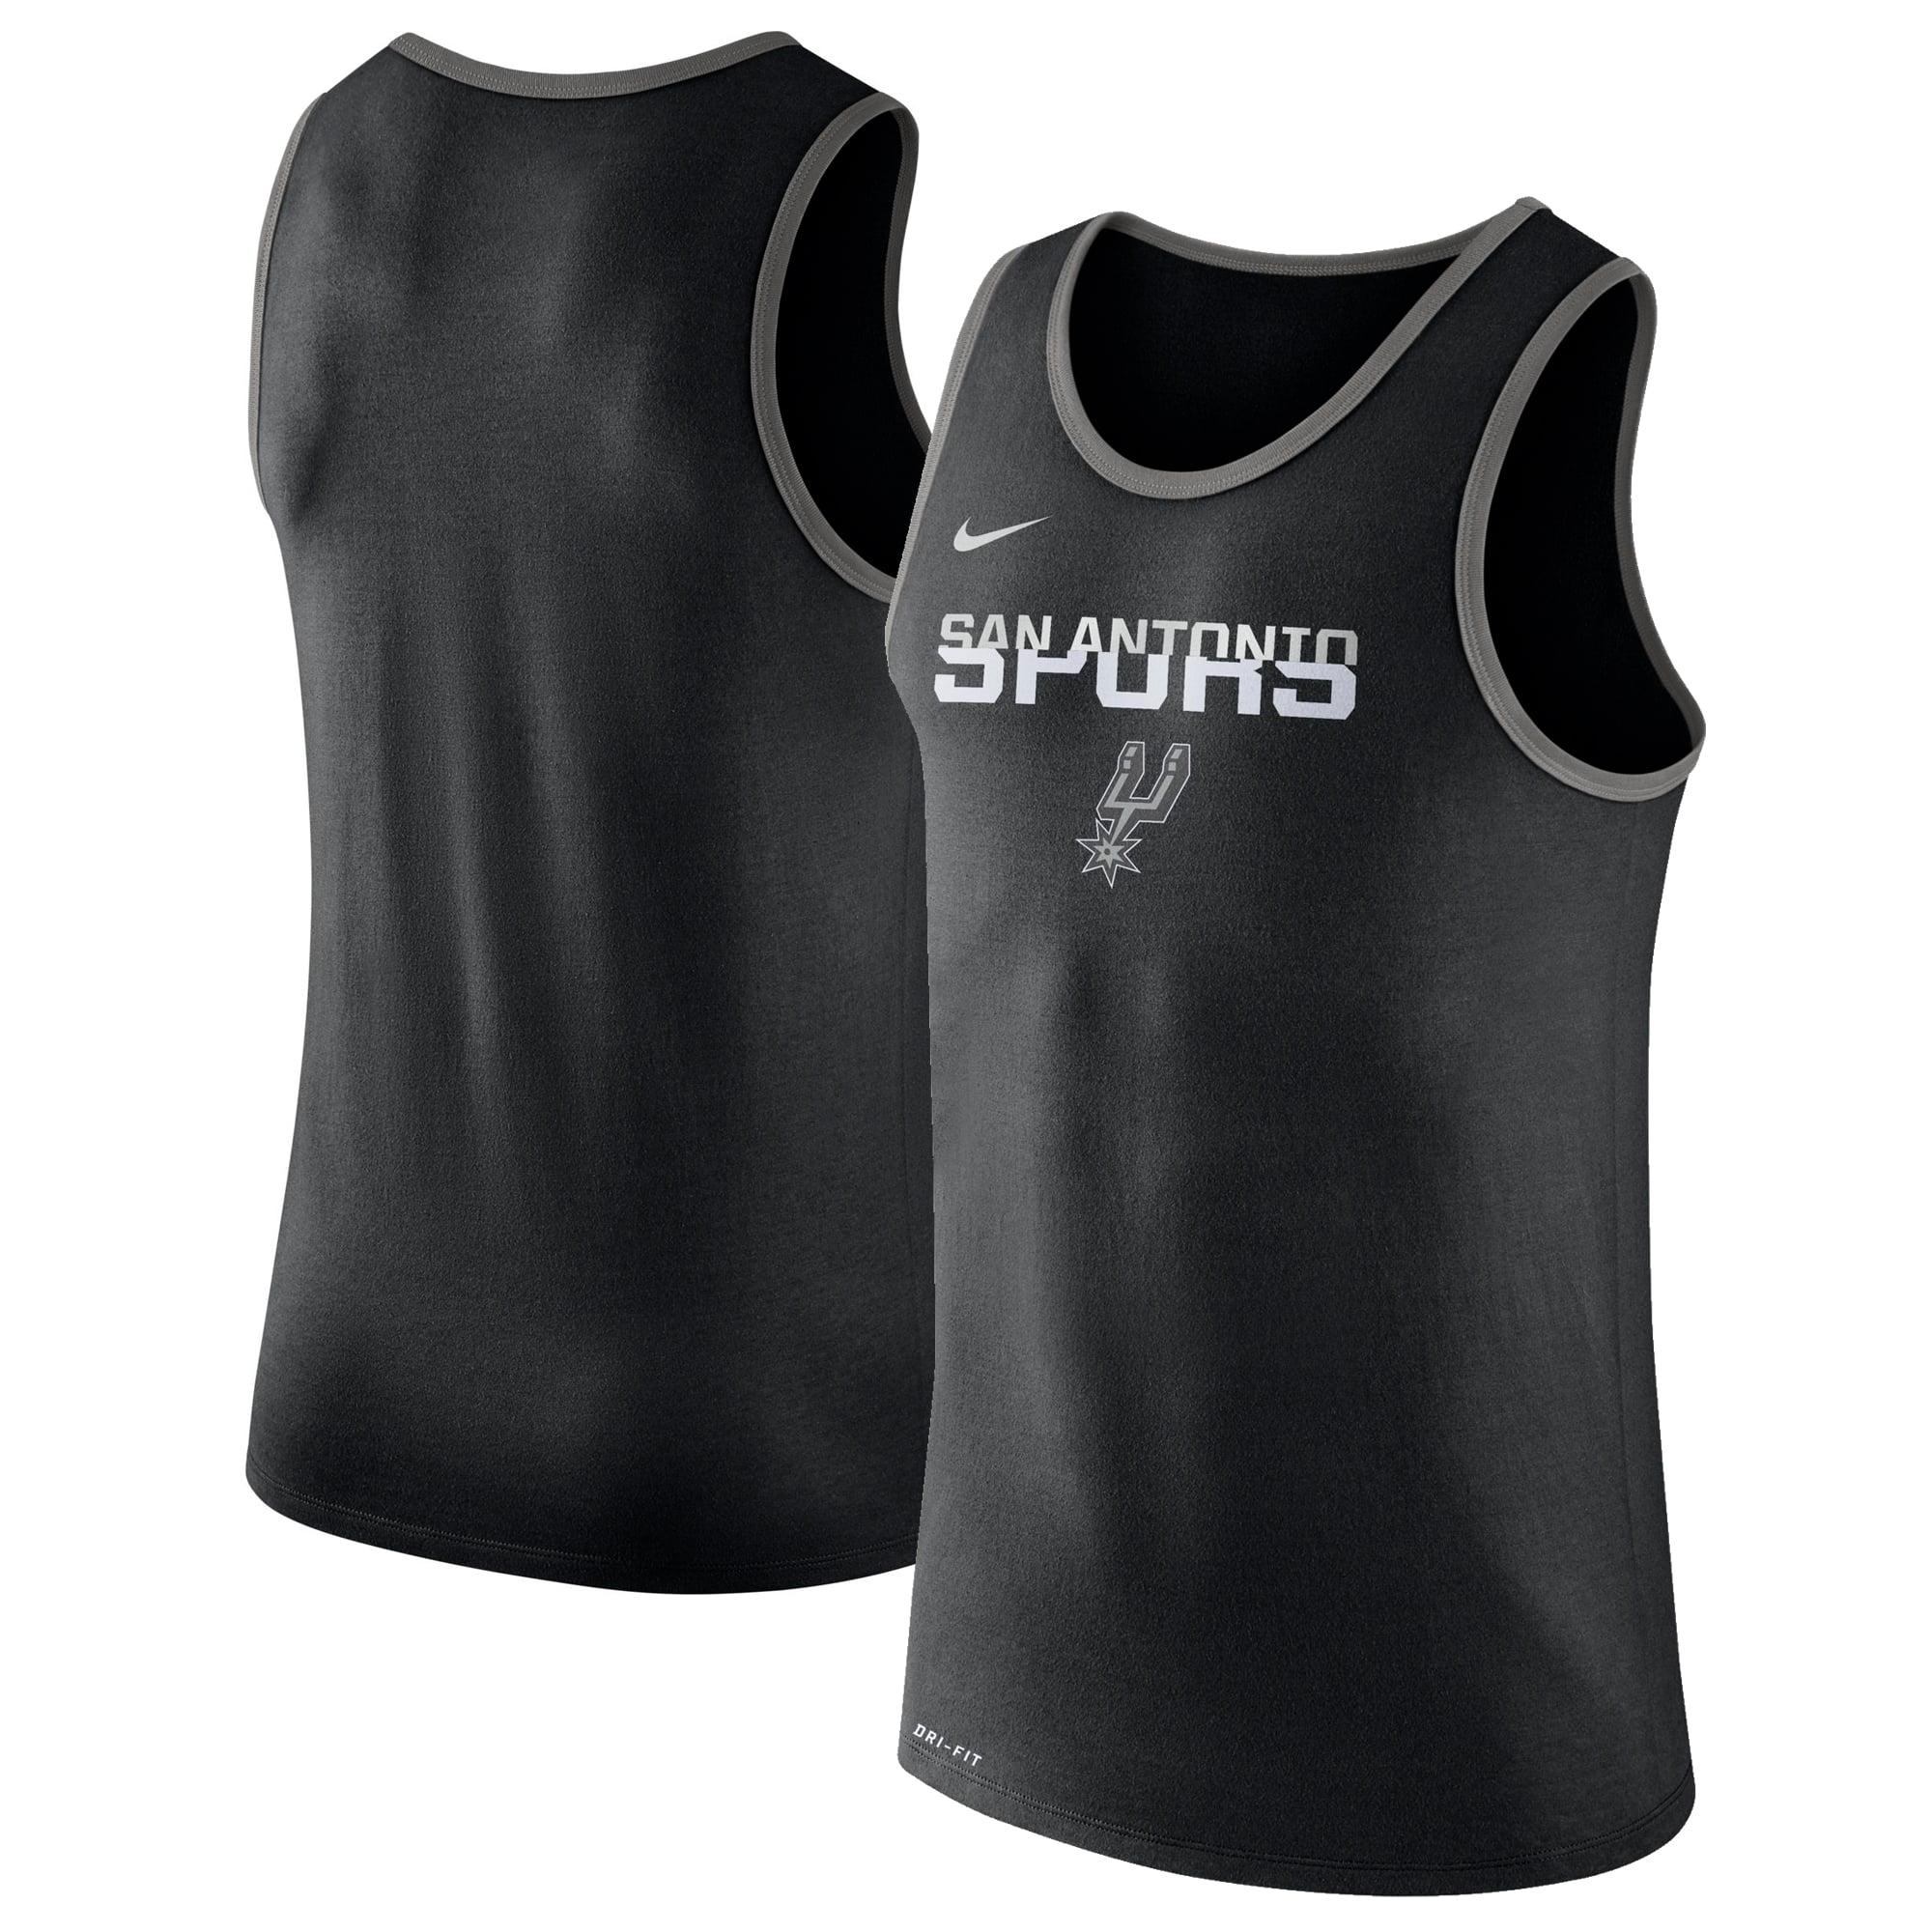 San Antonio Spurs Nike Logo Performance Tank Top - Black